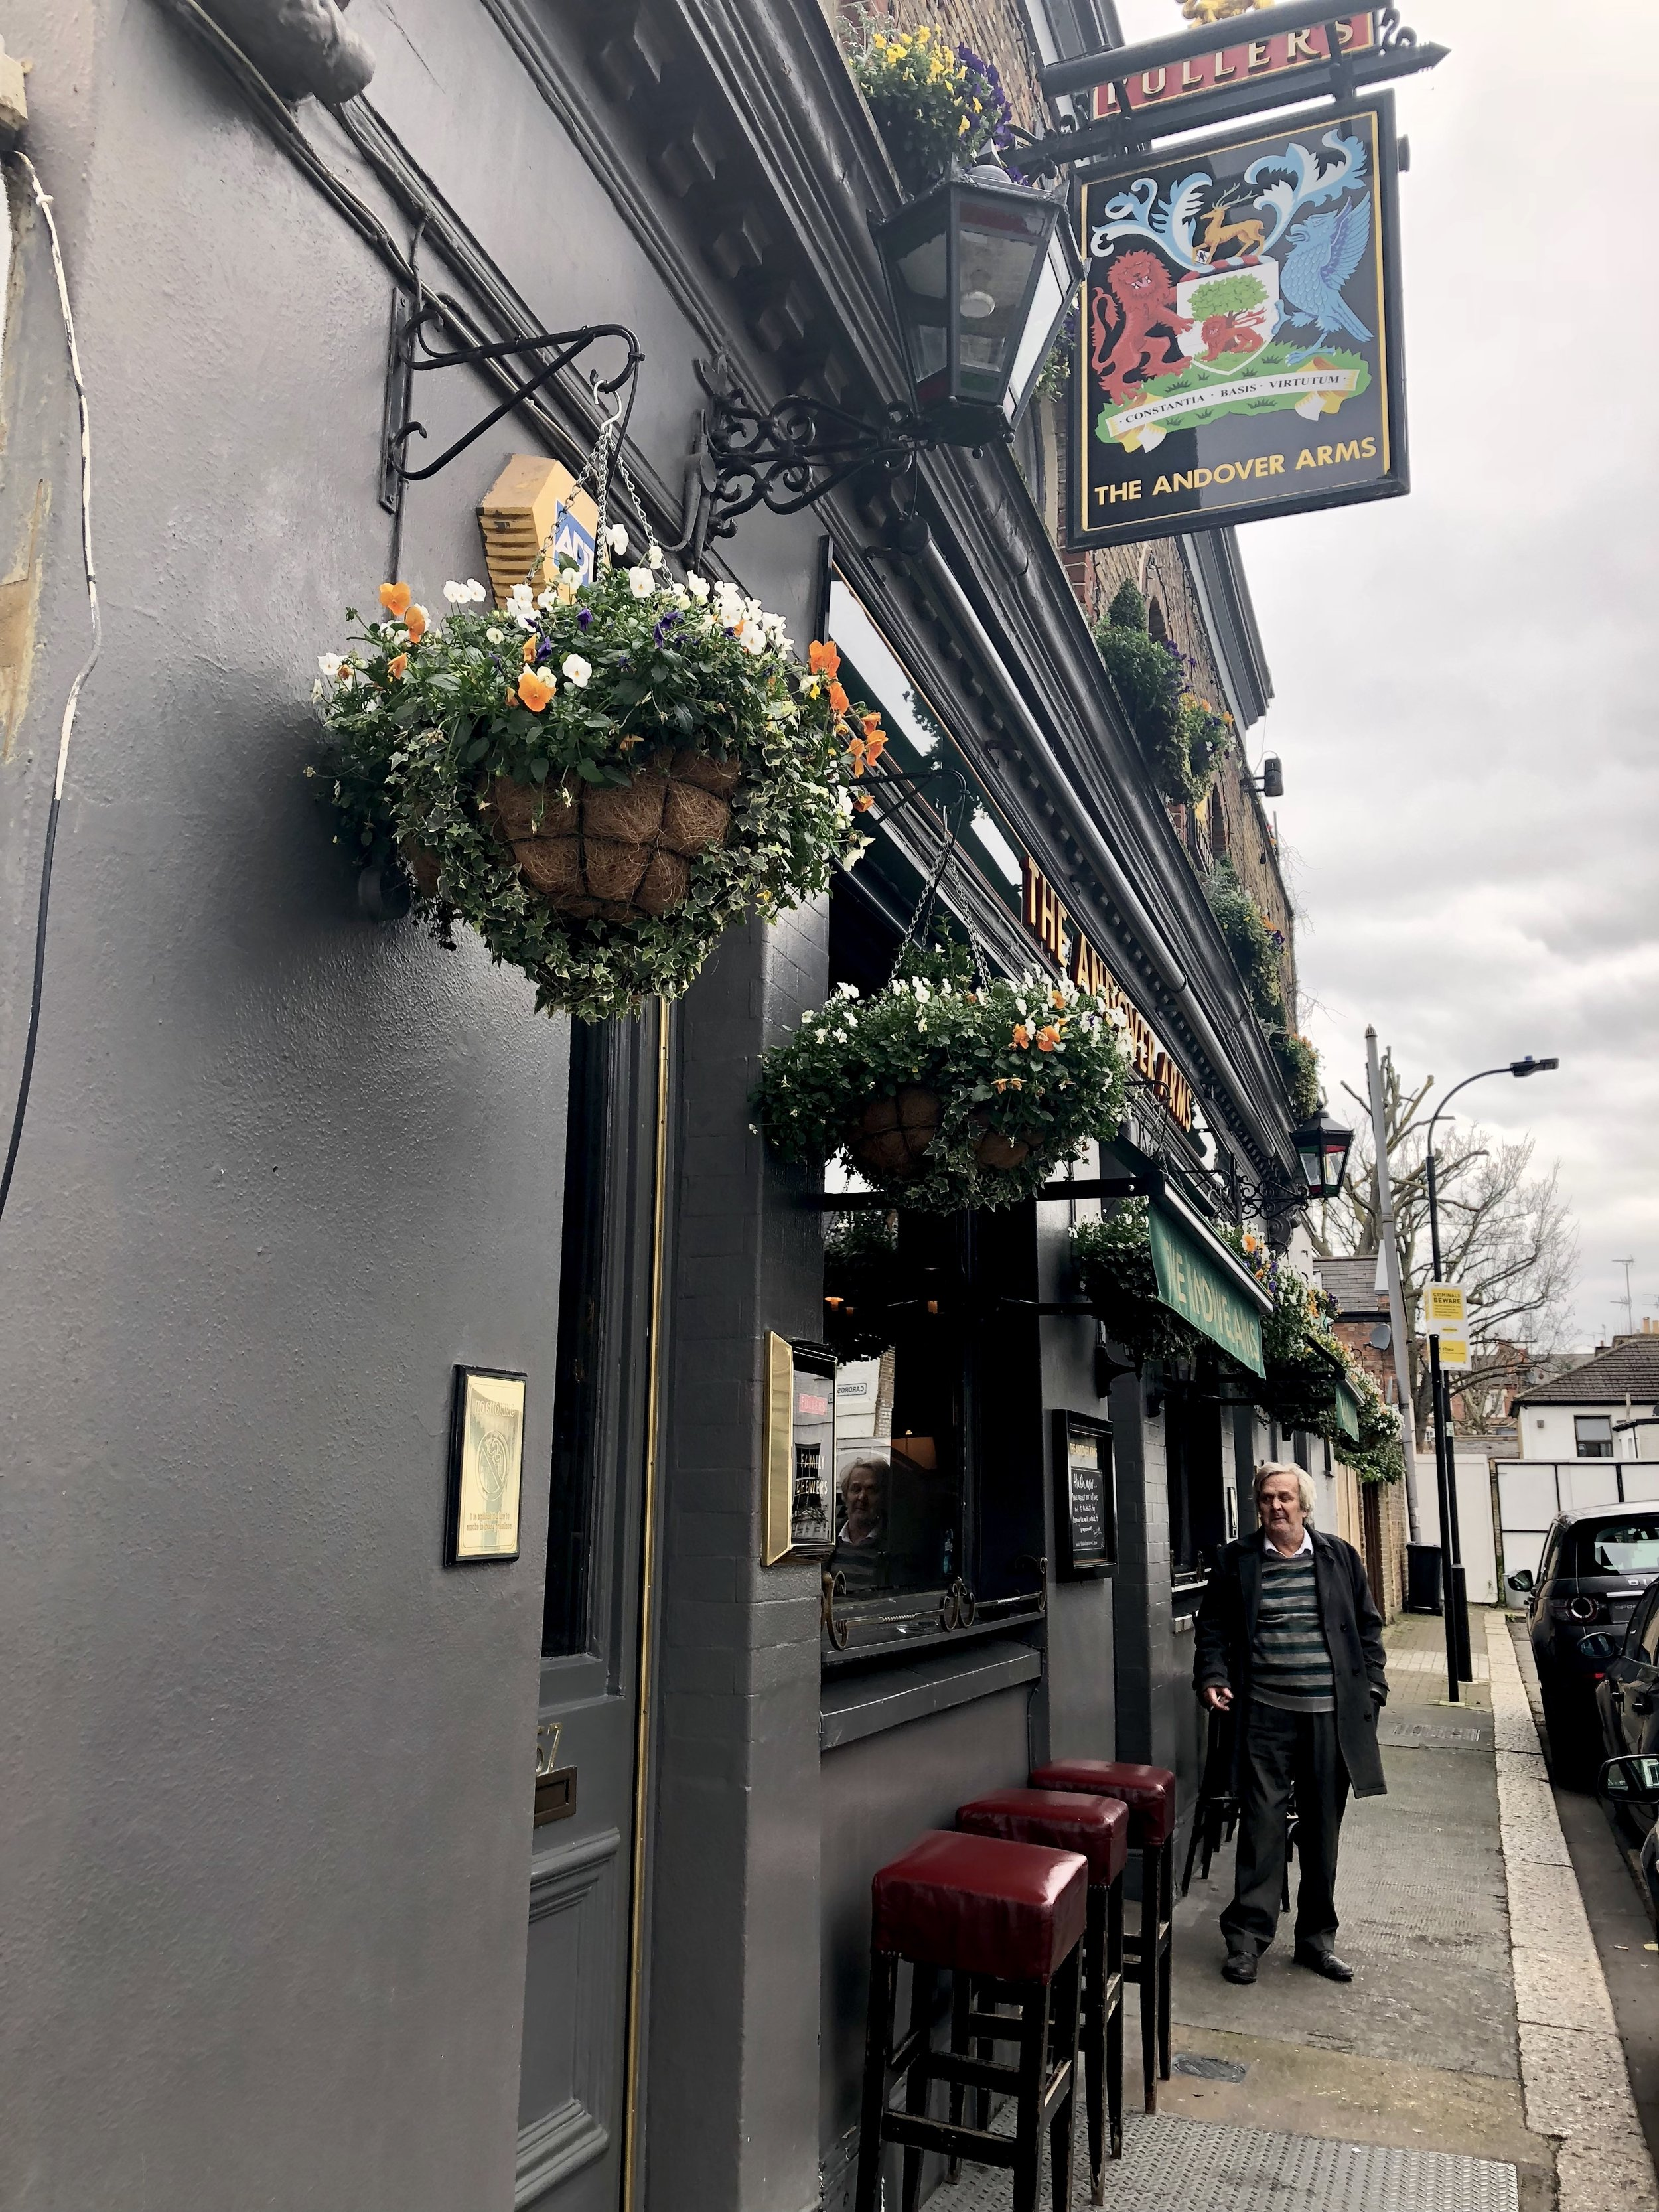 Best London Pubs: The Andover Arms, Brackenbury Village, Hammersmith